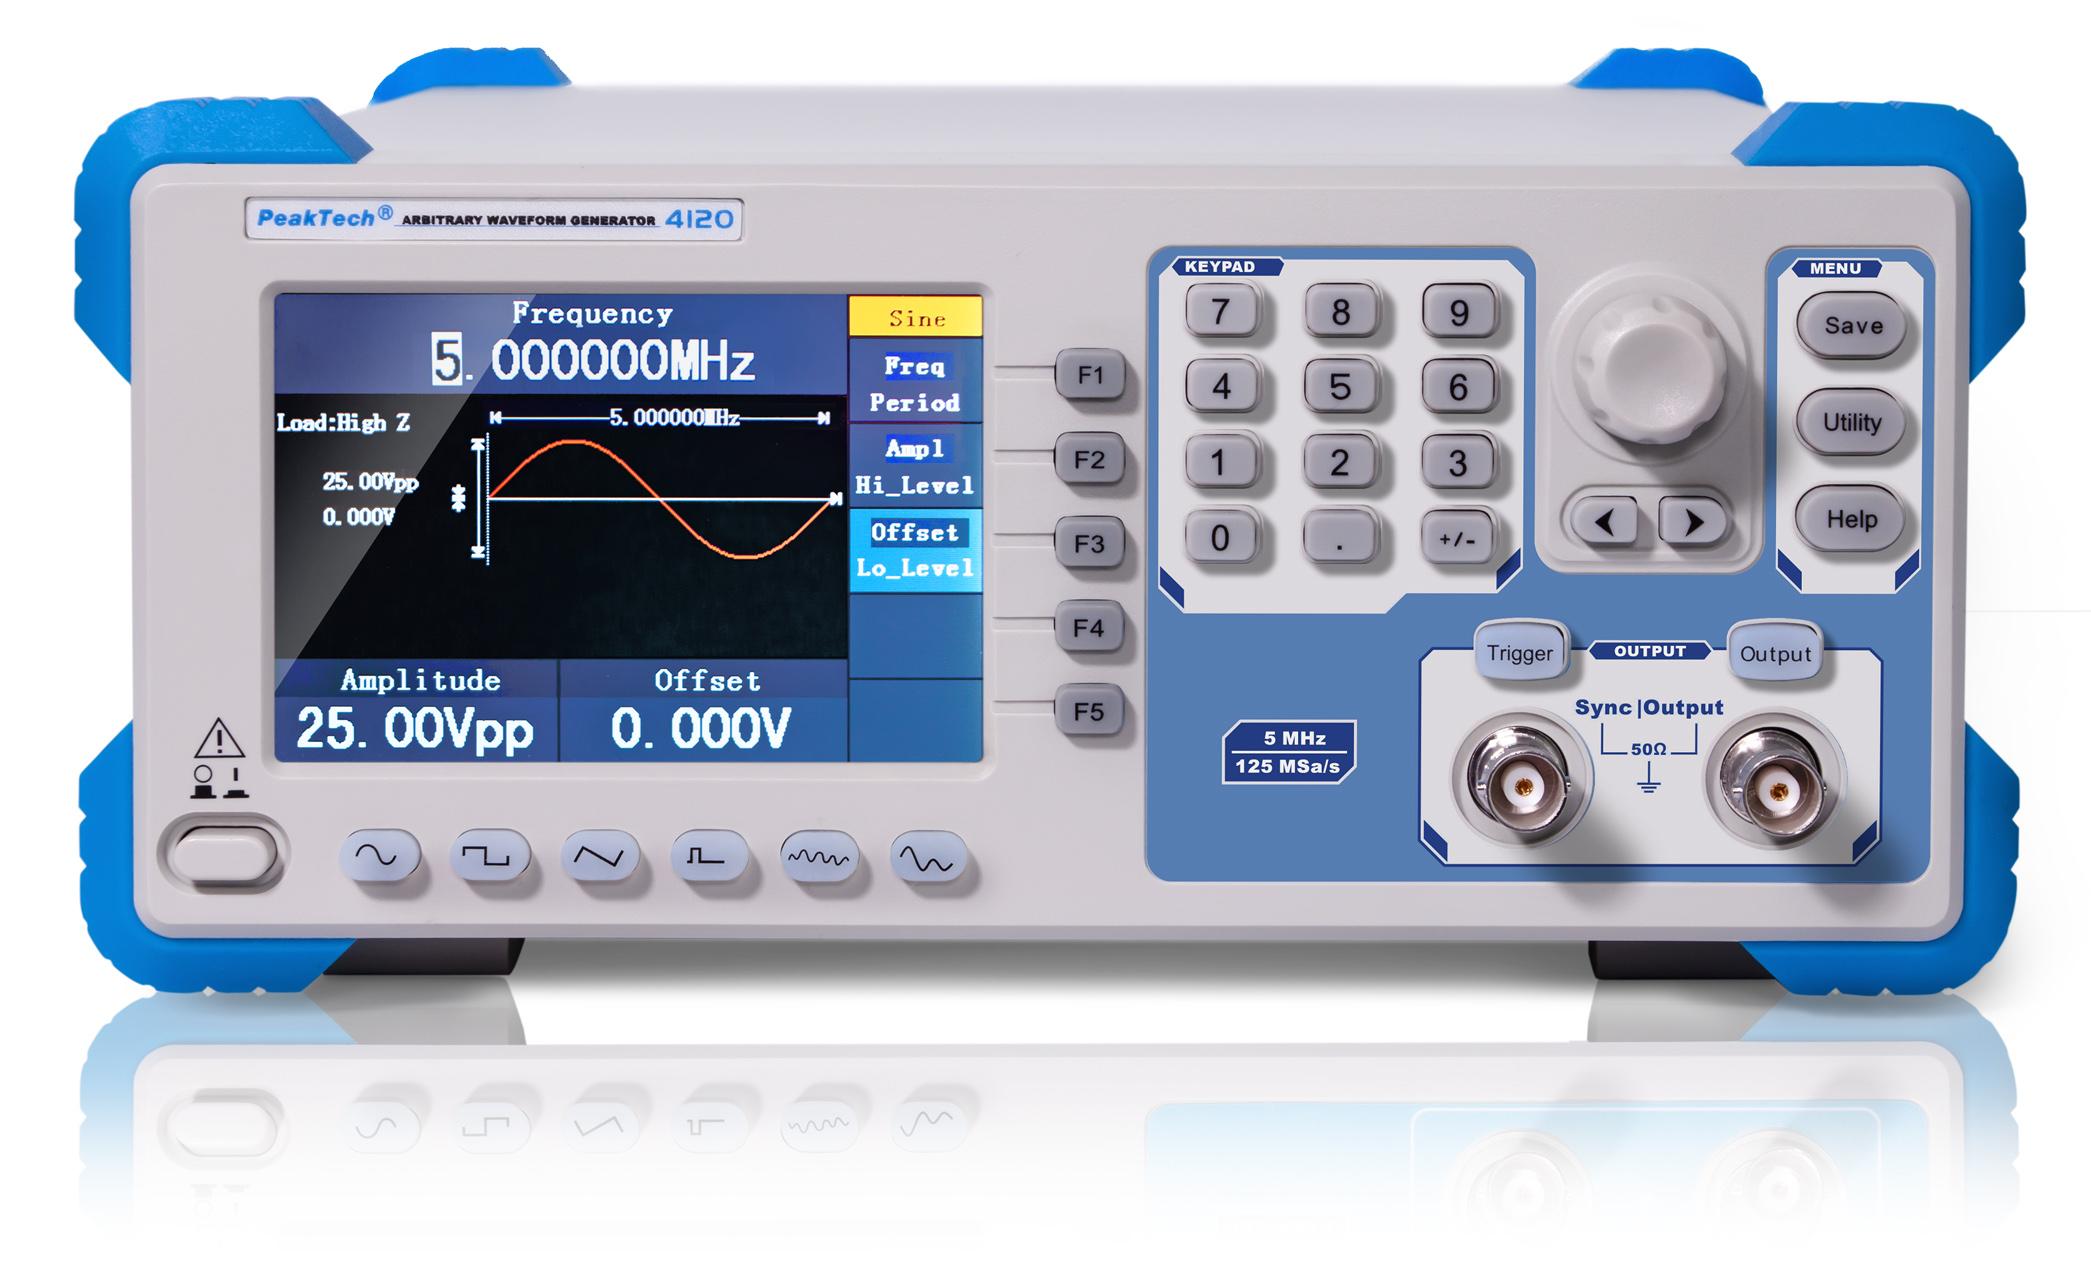 «PeakTech® P 4120» 1CH arbitrary function generator, 1 µHz - 5 MHz